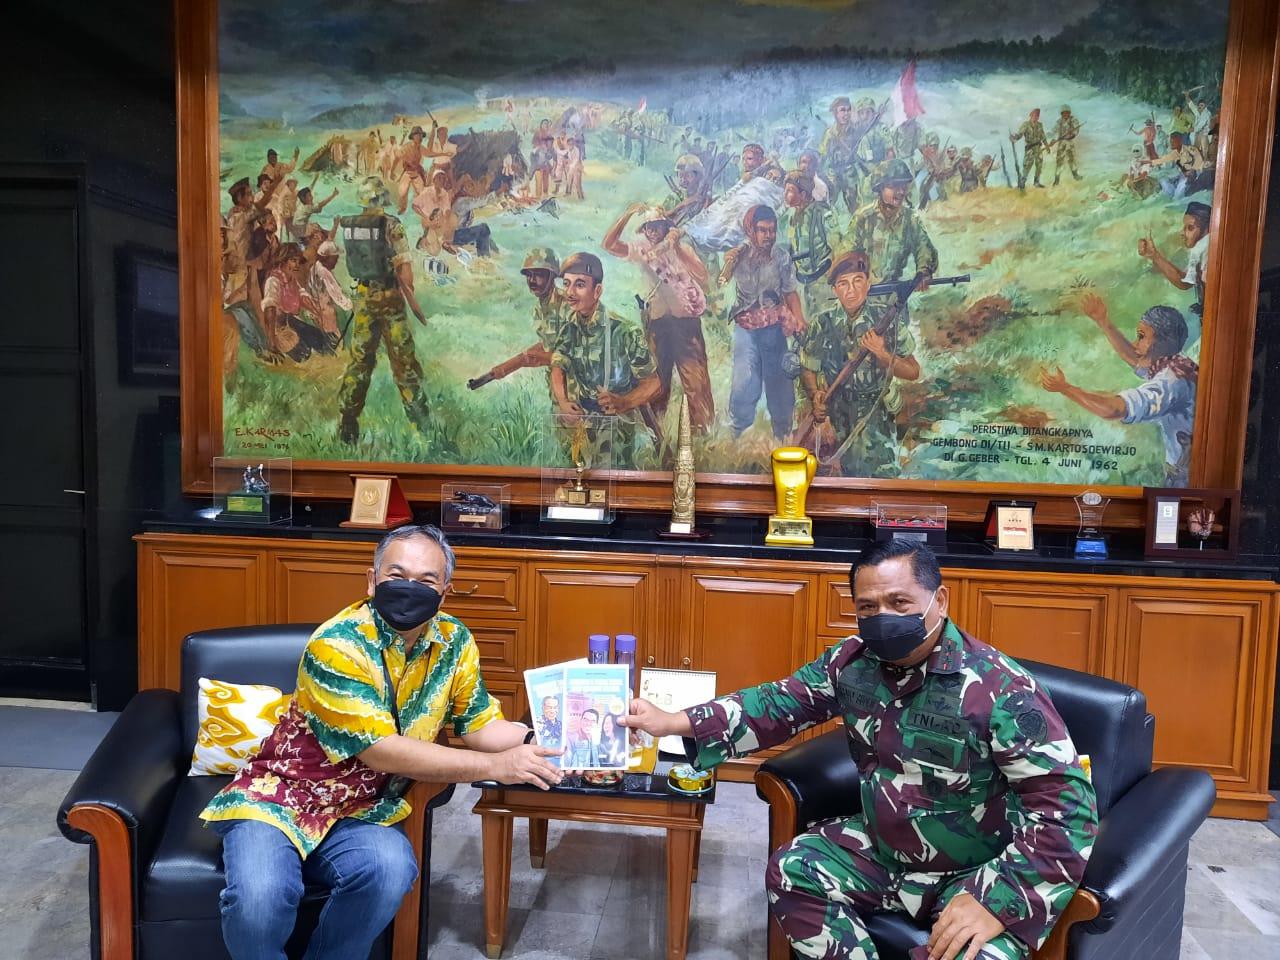 Pangdam III/Siliwangi Mayjen TNI Nugroho Budi Wiryanto bersama Pakar Komunikasi dan Motivator Nasional, Dr Aqua Dwipayana. (Foto: Dokumen)